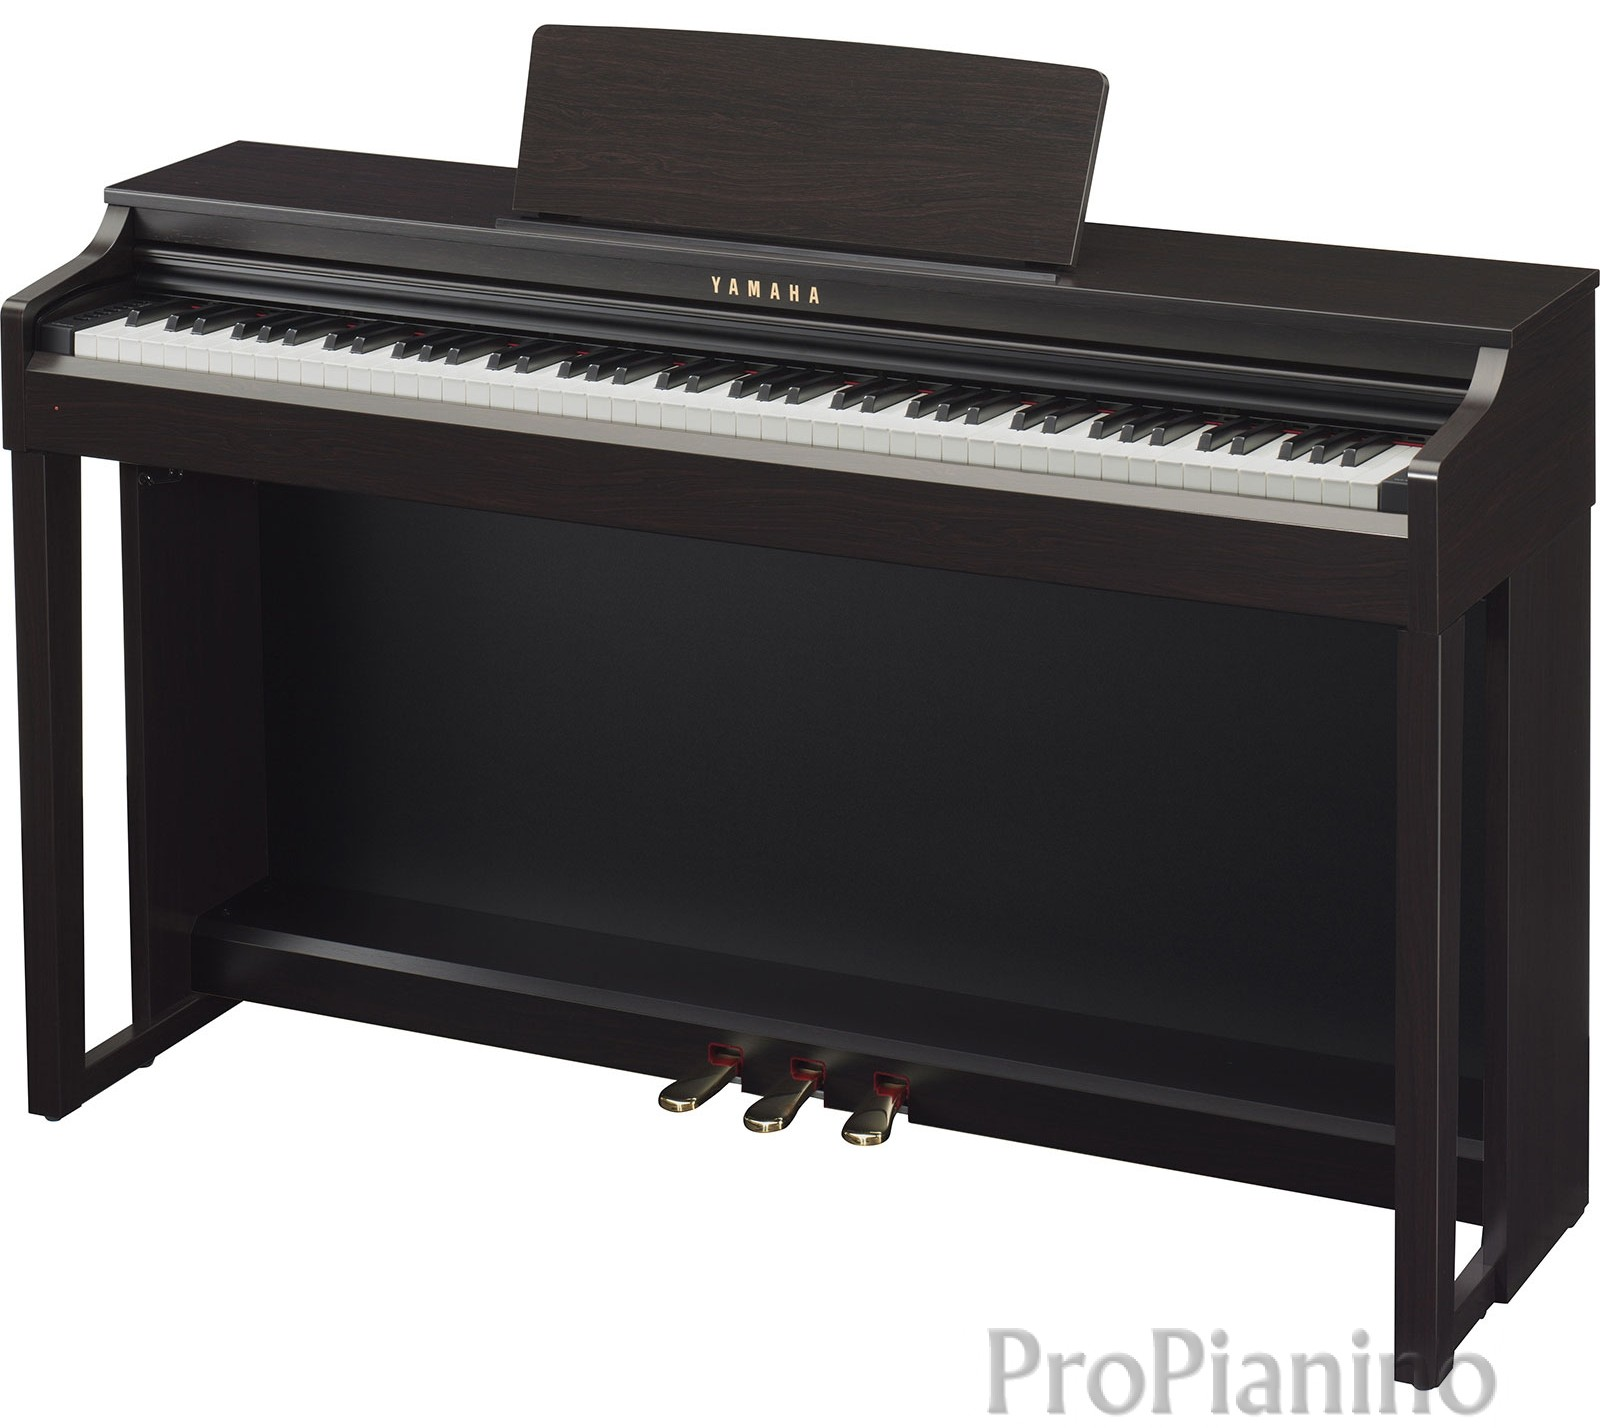 Цифровое пианино премиум класса Yamaha clp 525